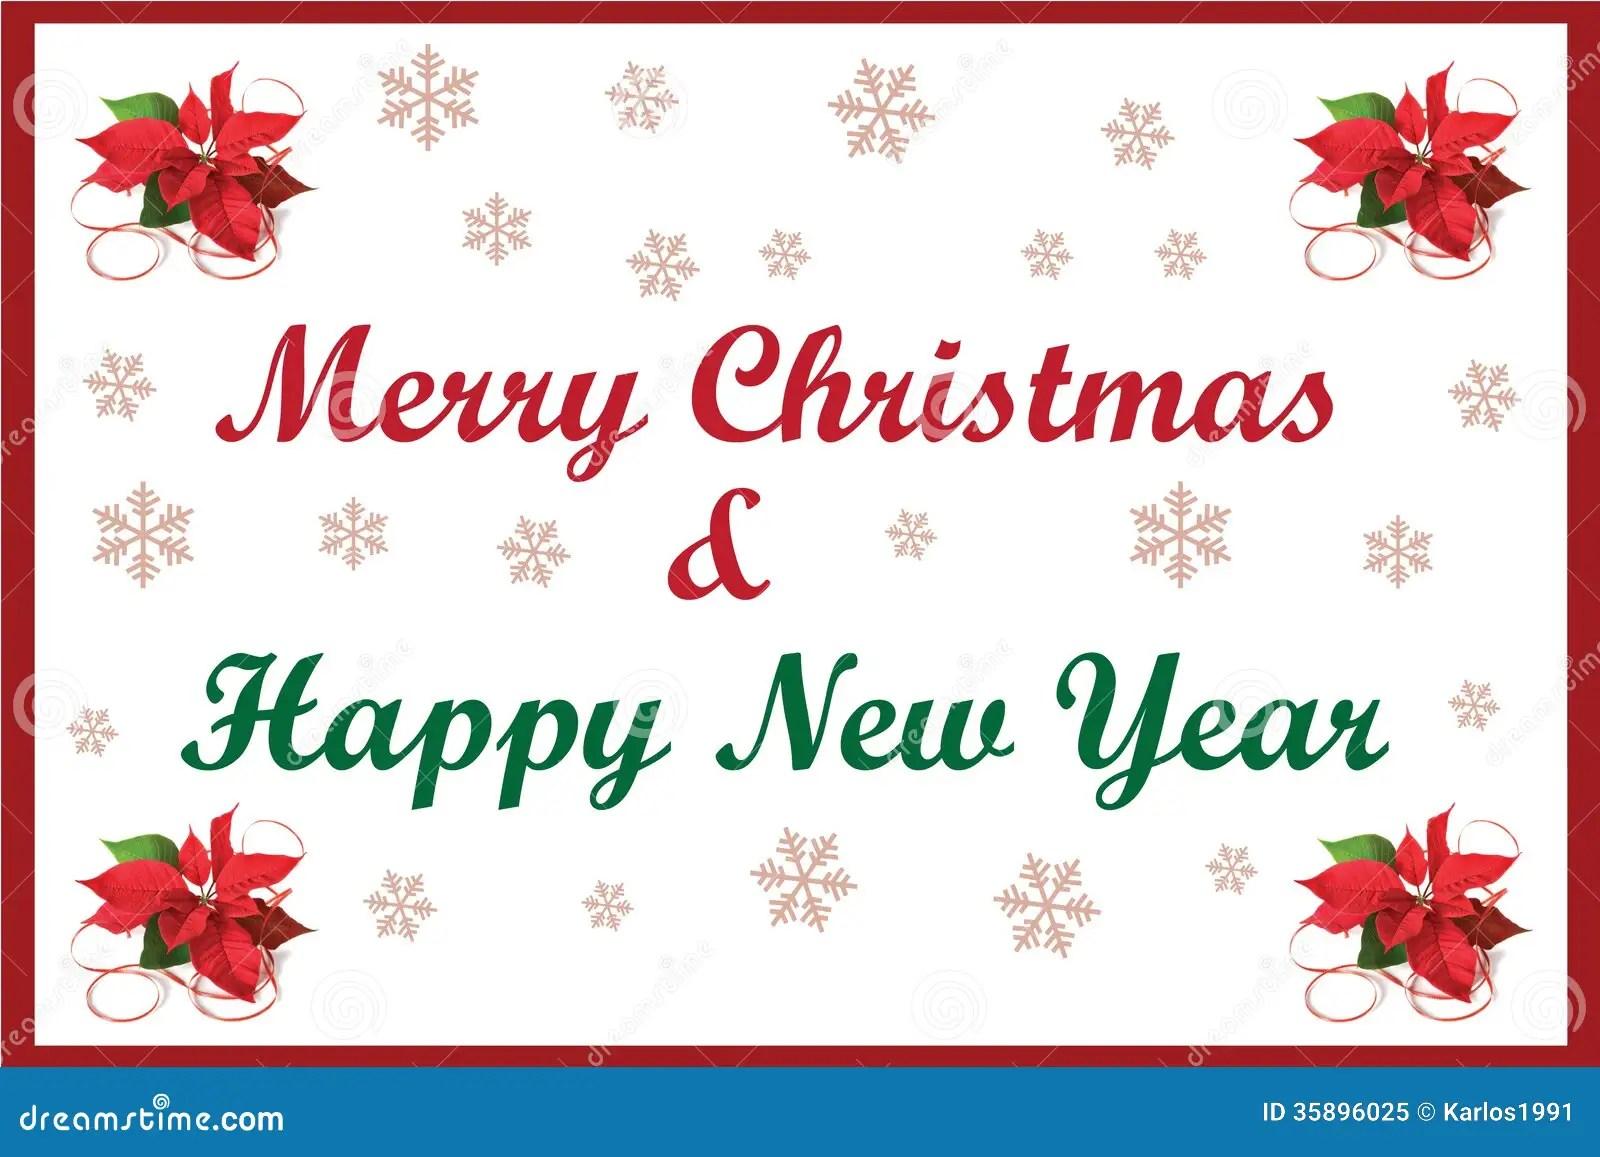 Christmas Card 06 Royalty Free Stock Photo Image 35896025